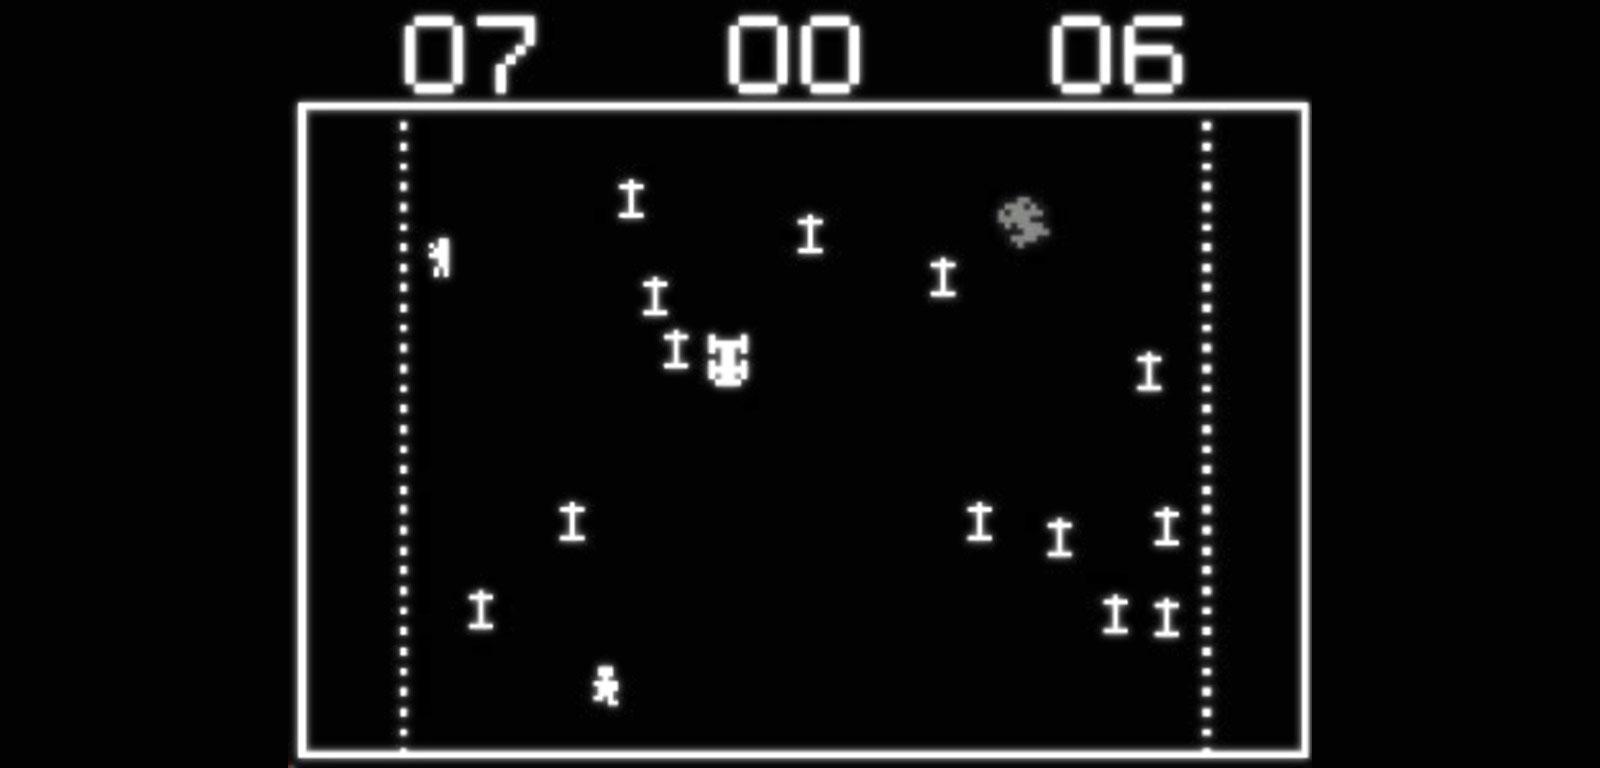 Resultado de imagem para death race game atari